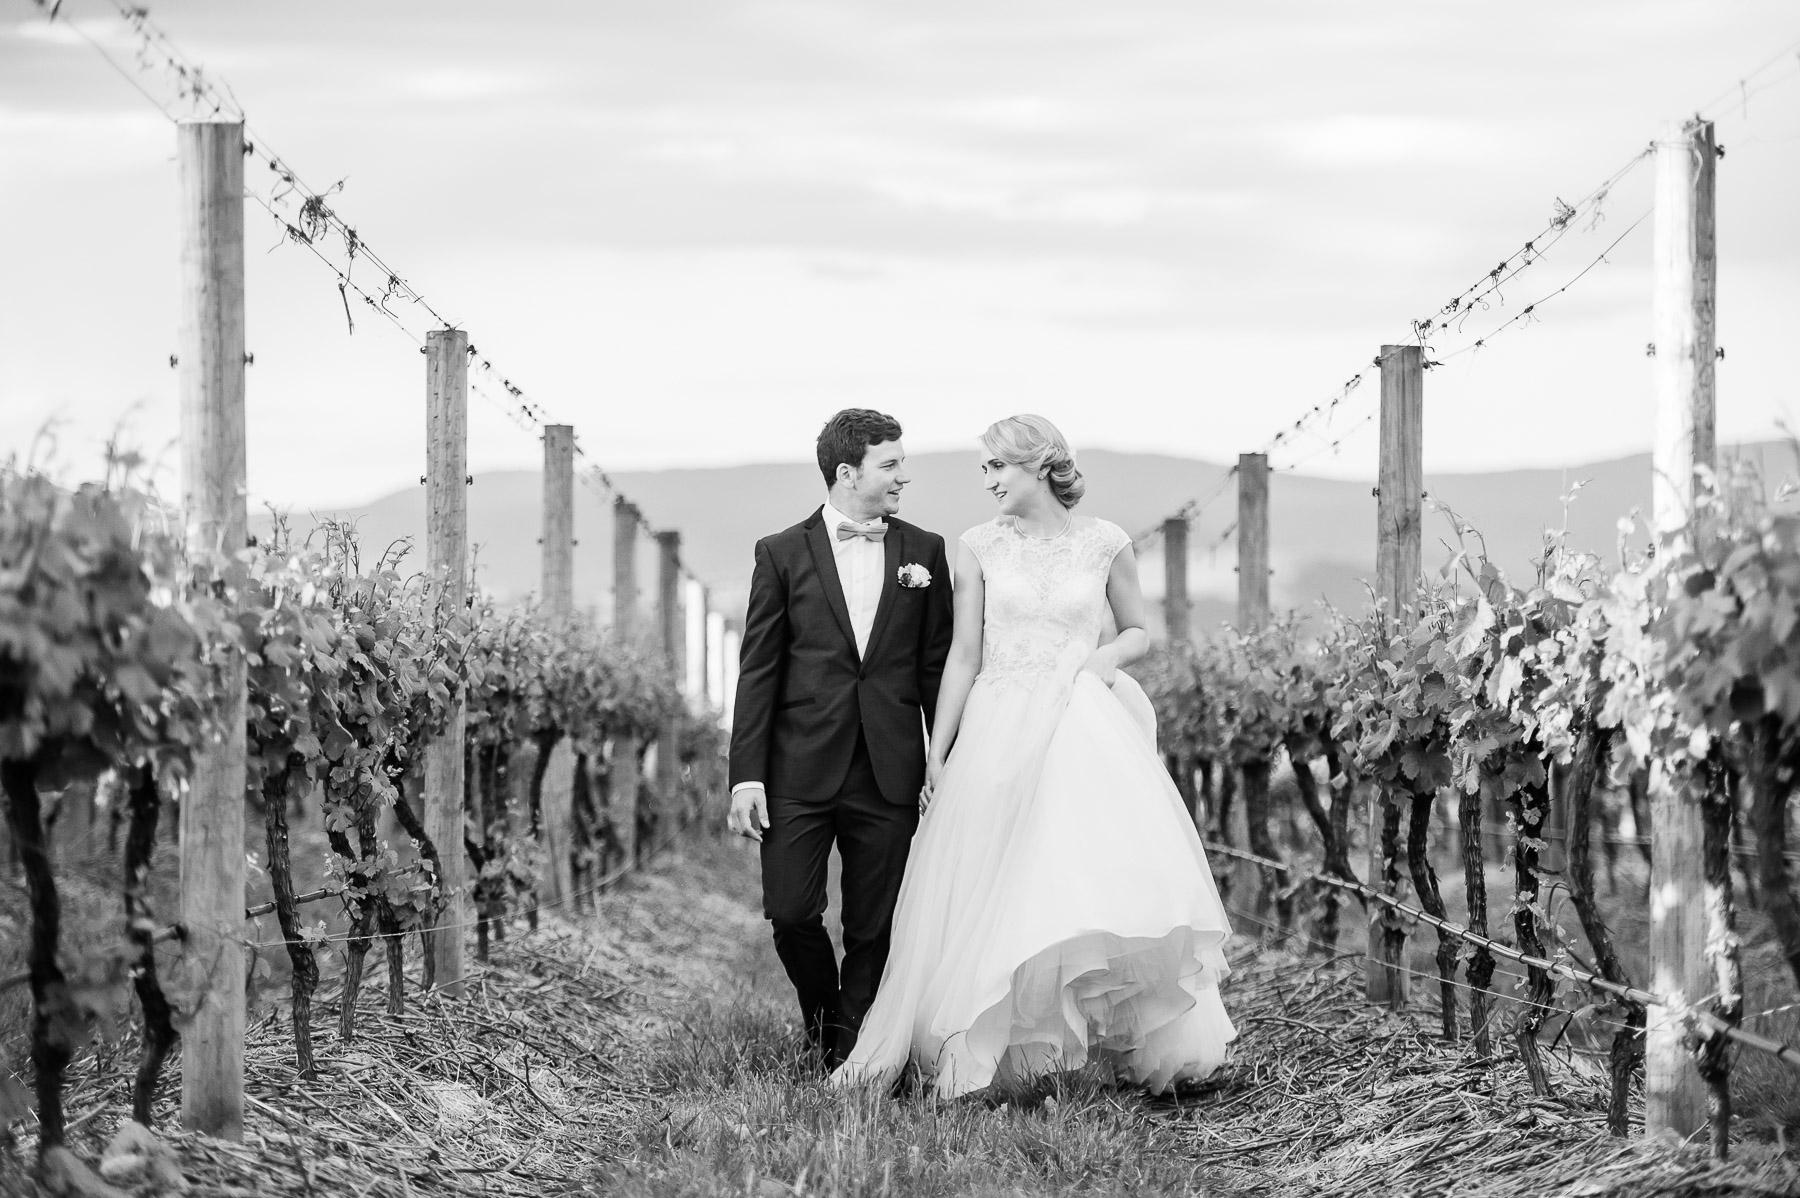 Marnie_and_Charlie_Yarra_Valley_Wedding_Blog-76.jpg